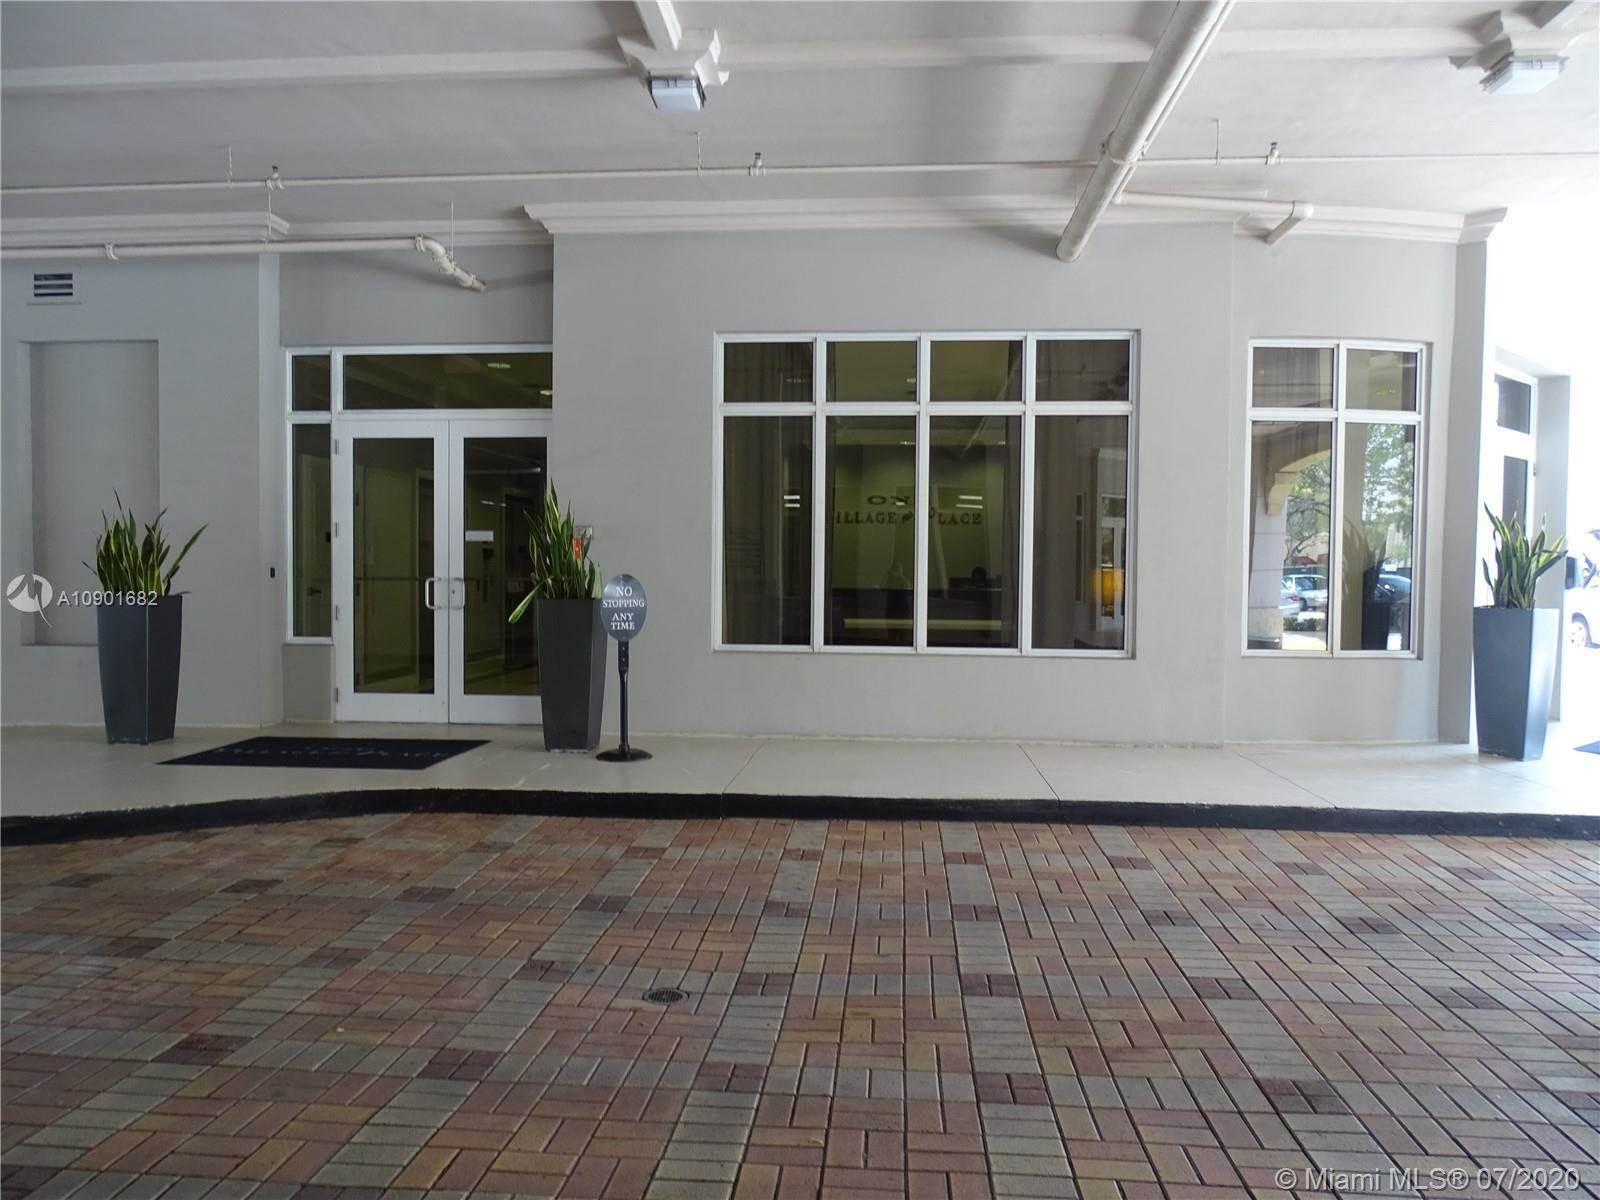 4100 Salzedo St, #518, Coral Gables, FL 33146